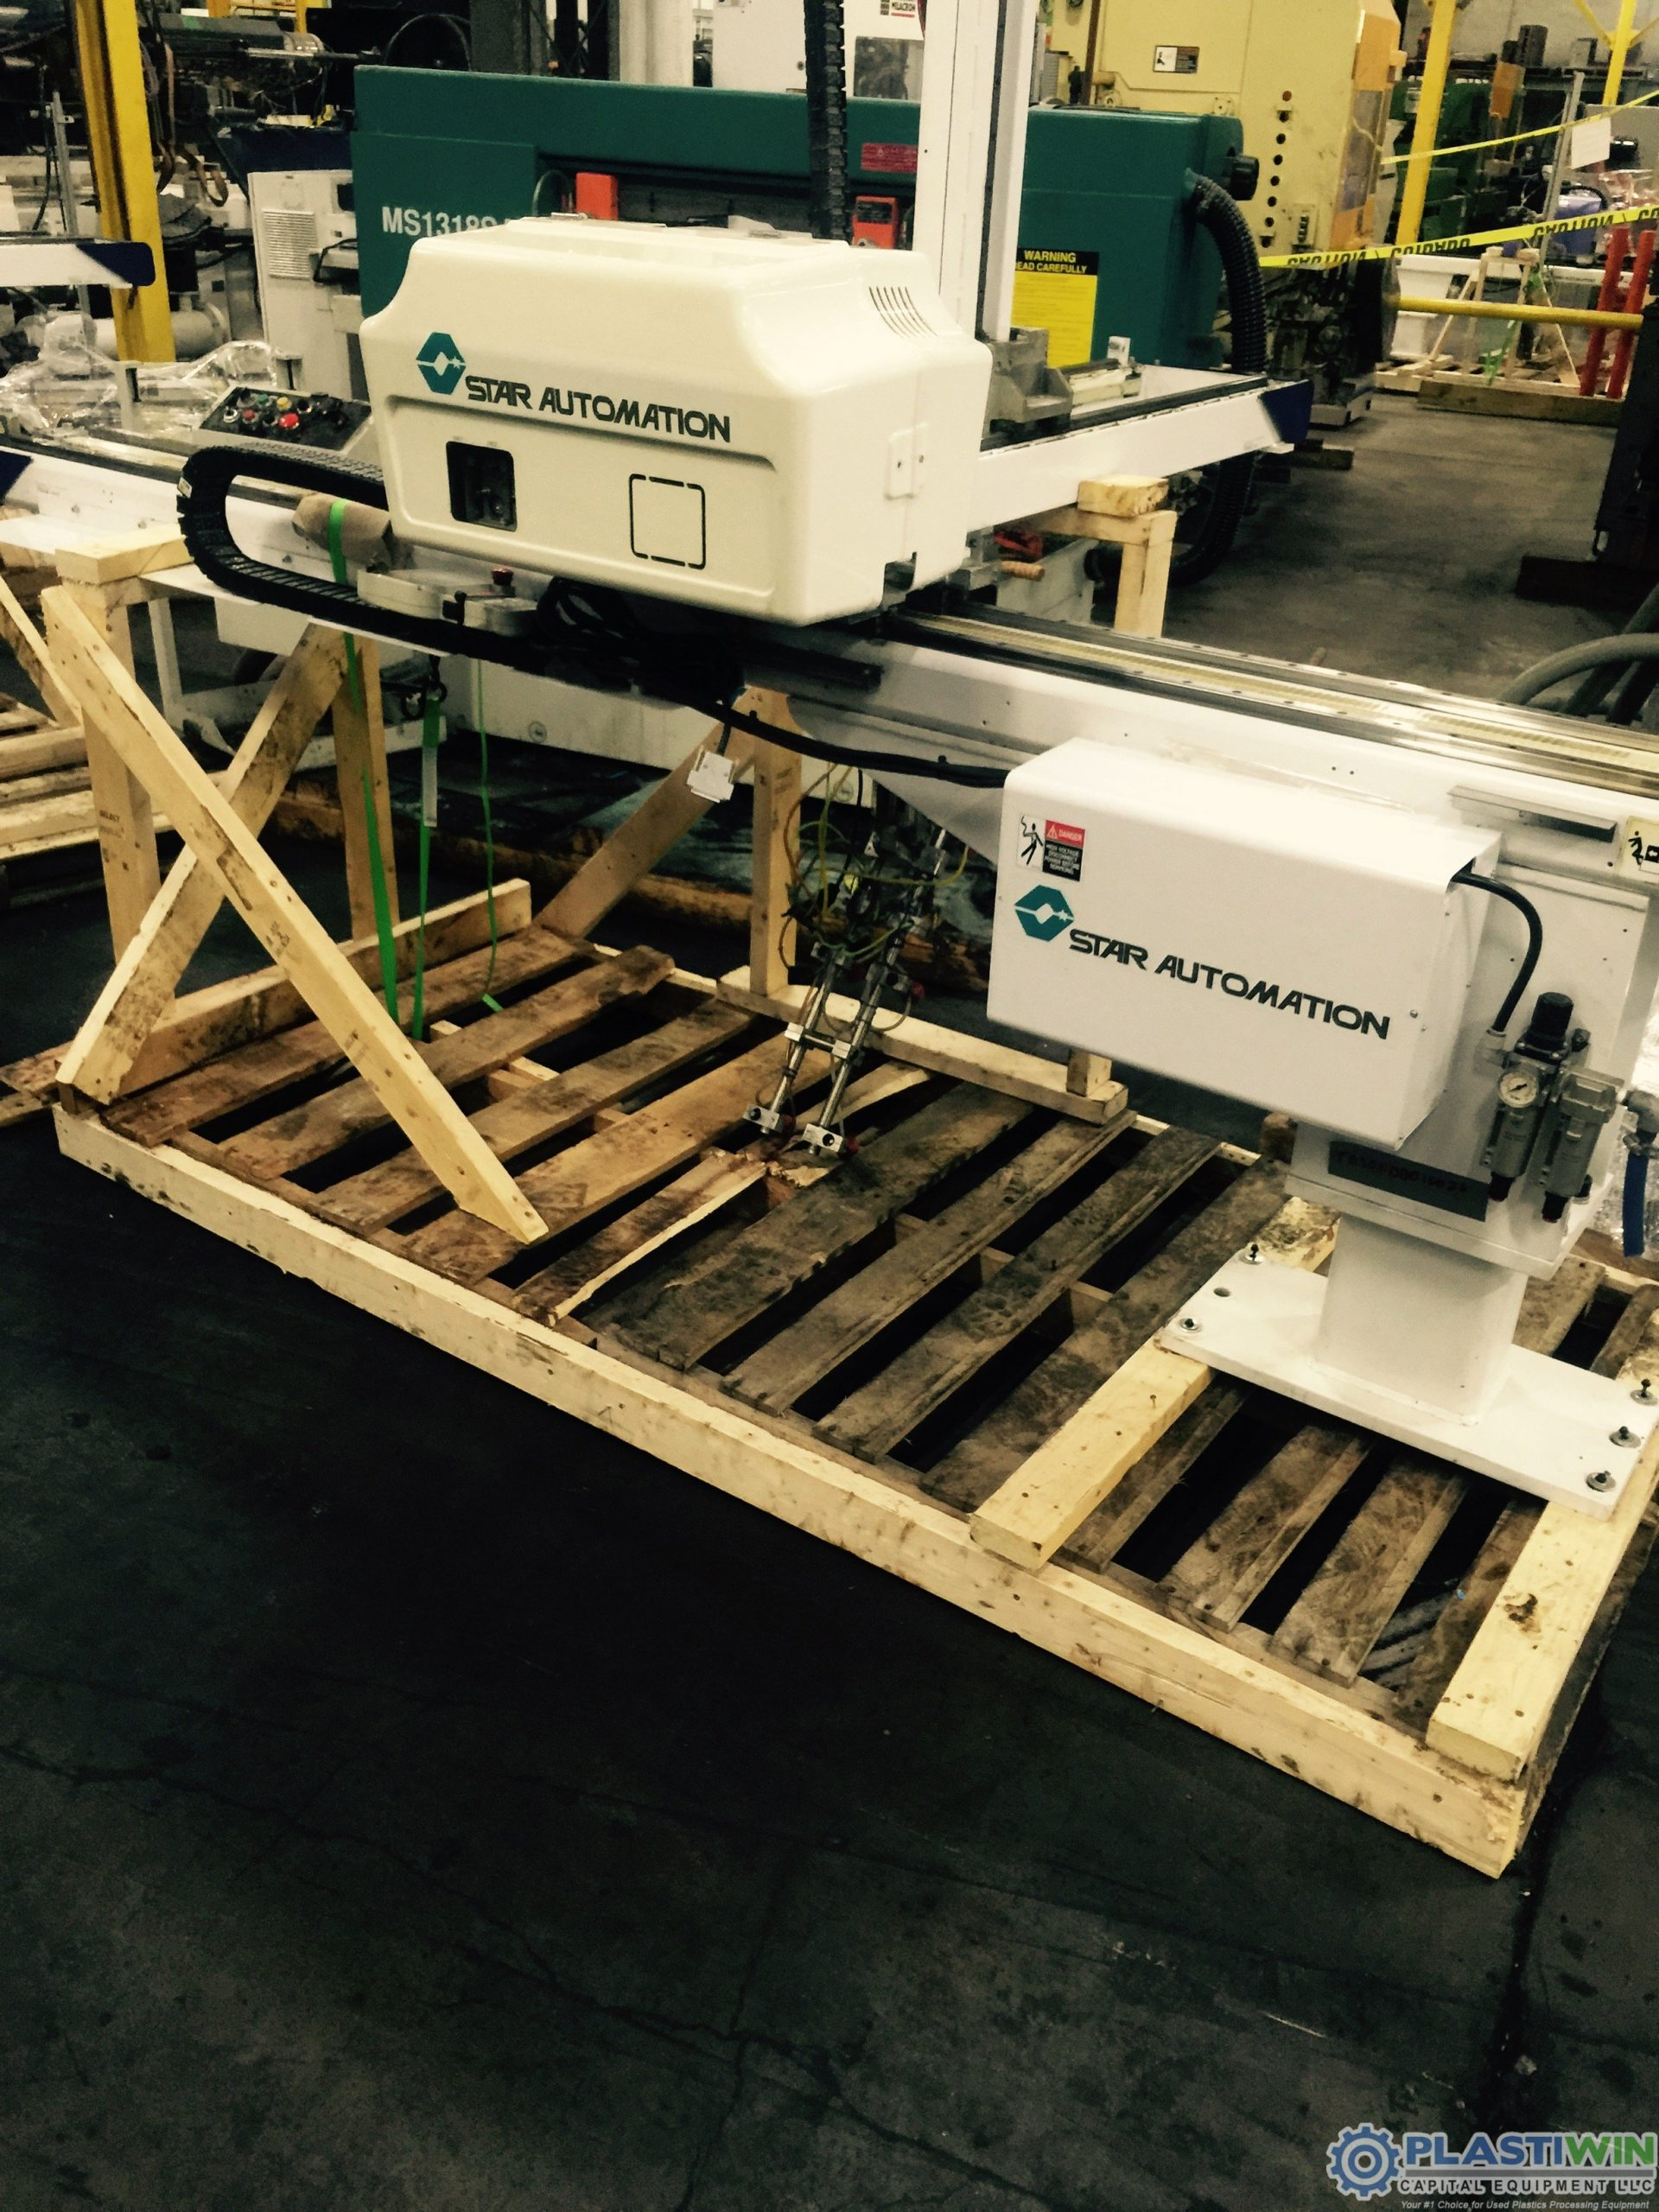 Star Automation LW-1400V1-380 All Servo Robot (2)